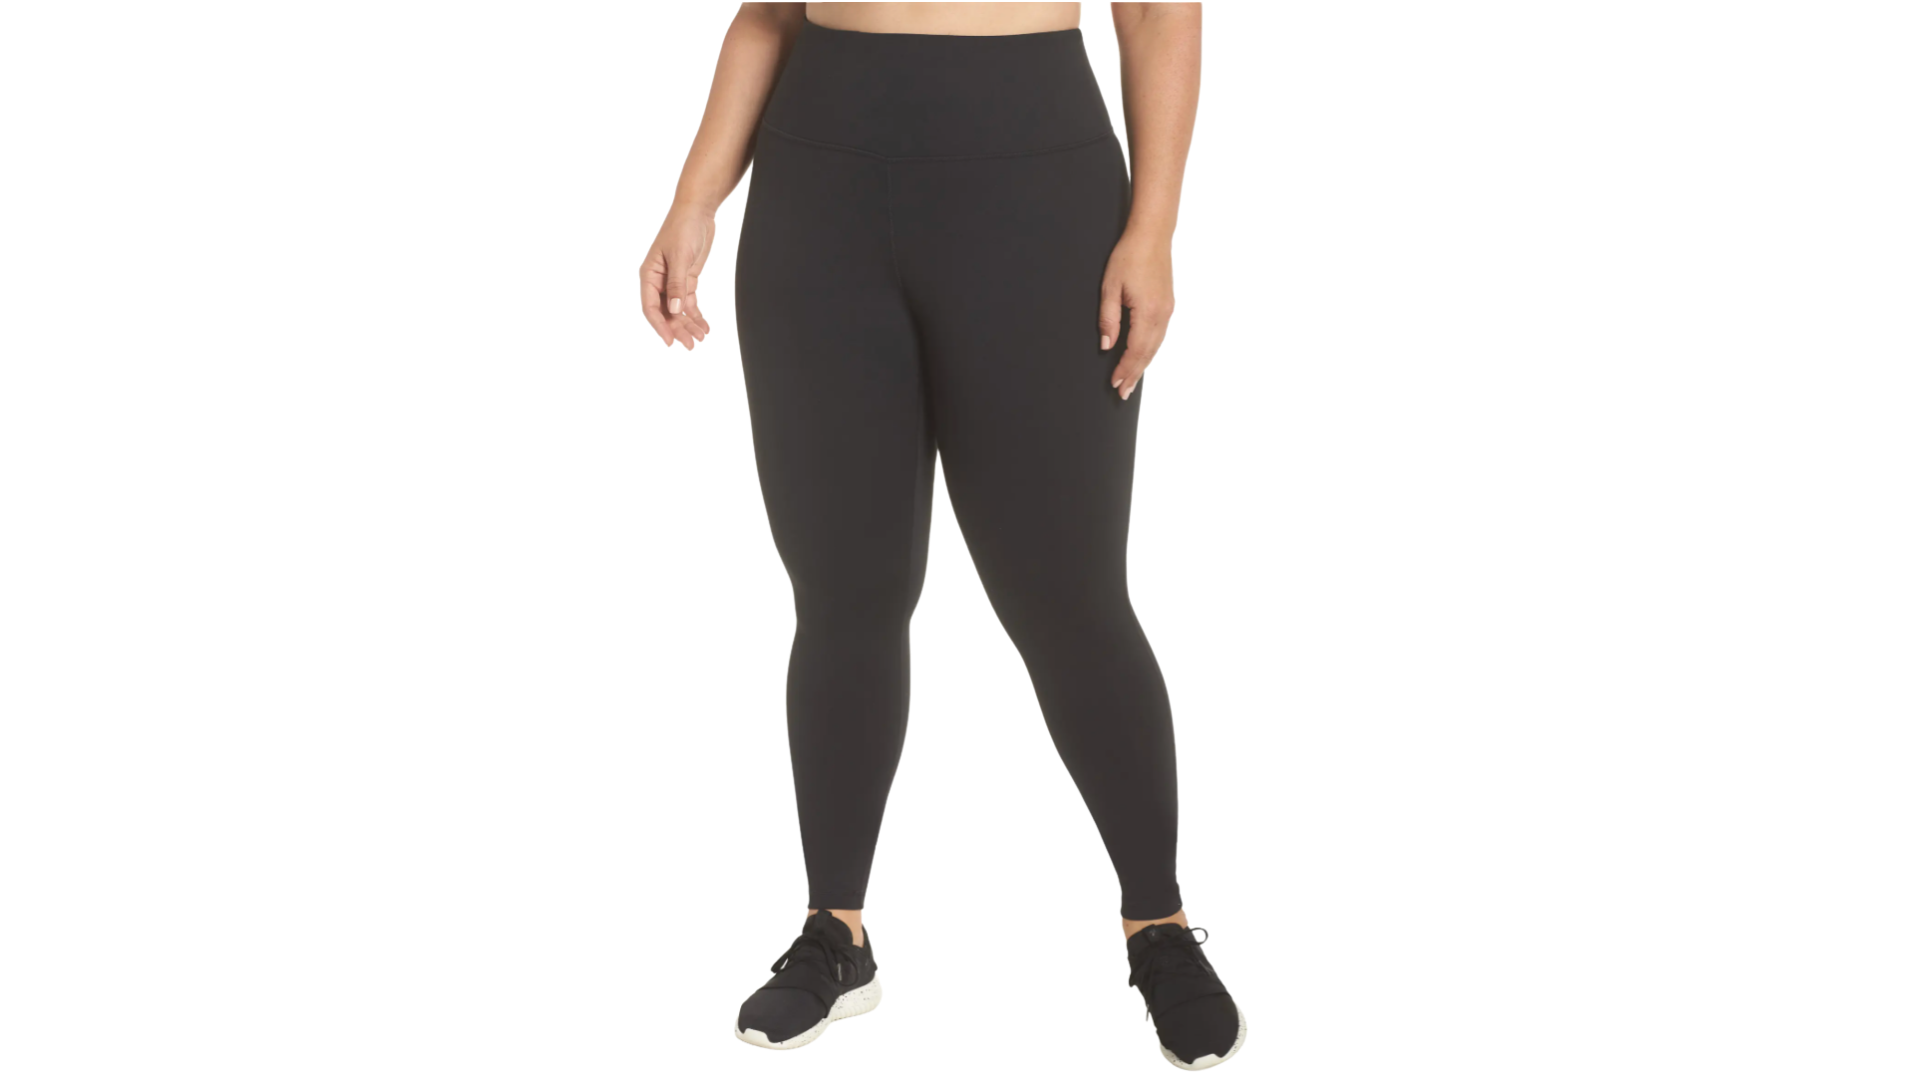 Zella best plus size leggings with pockets